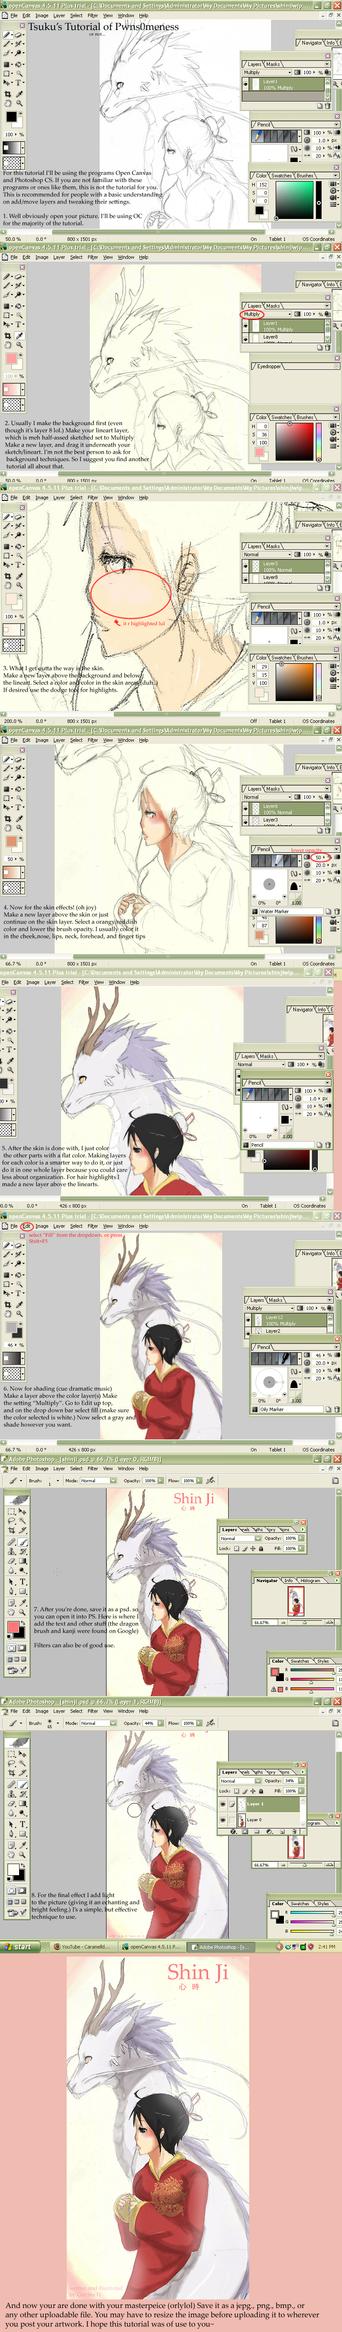 it a tutorial by Tsuku81012